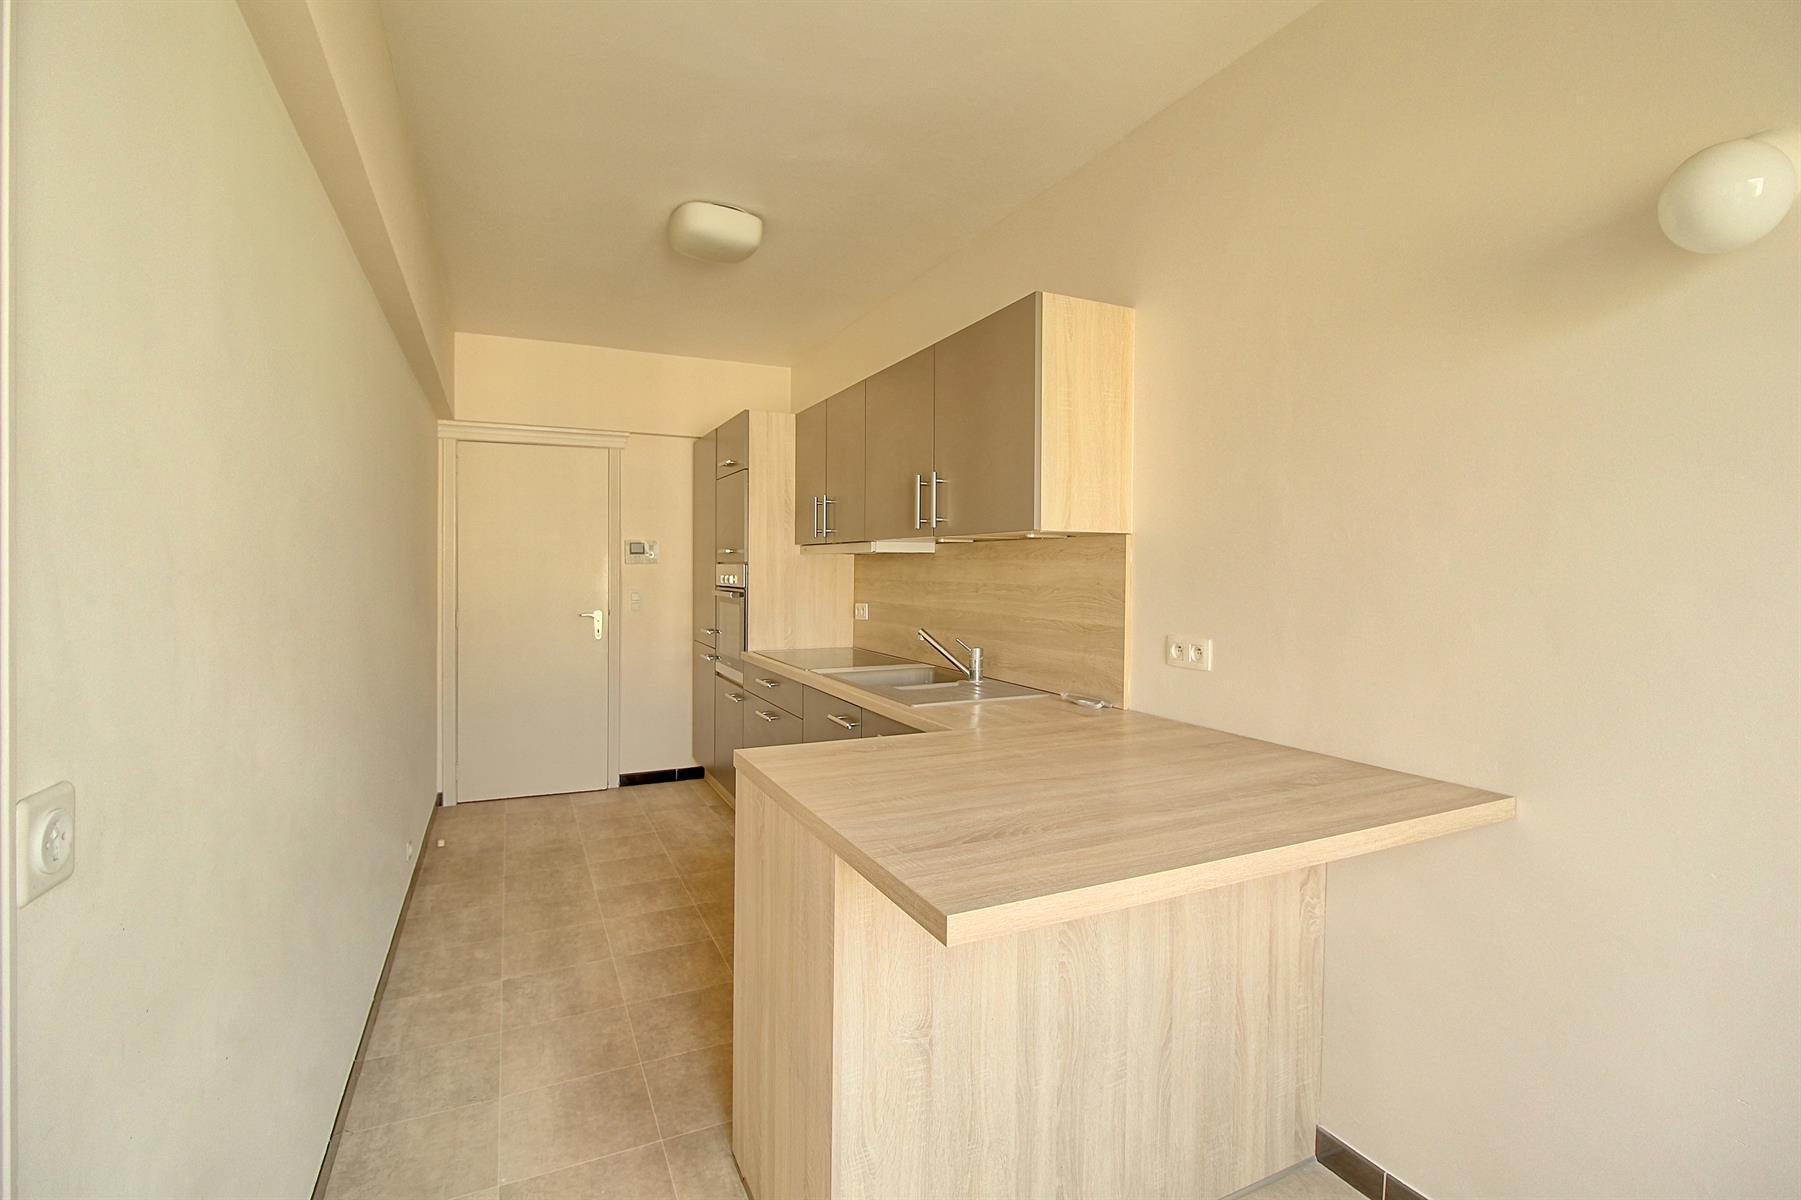 Appartement - Woluwe-Saint-Lambert - #4183448-1